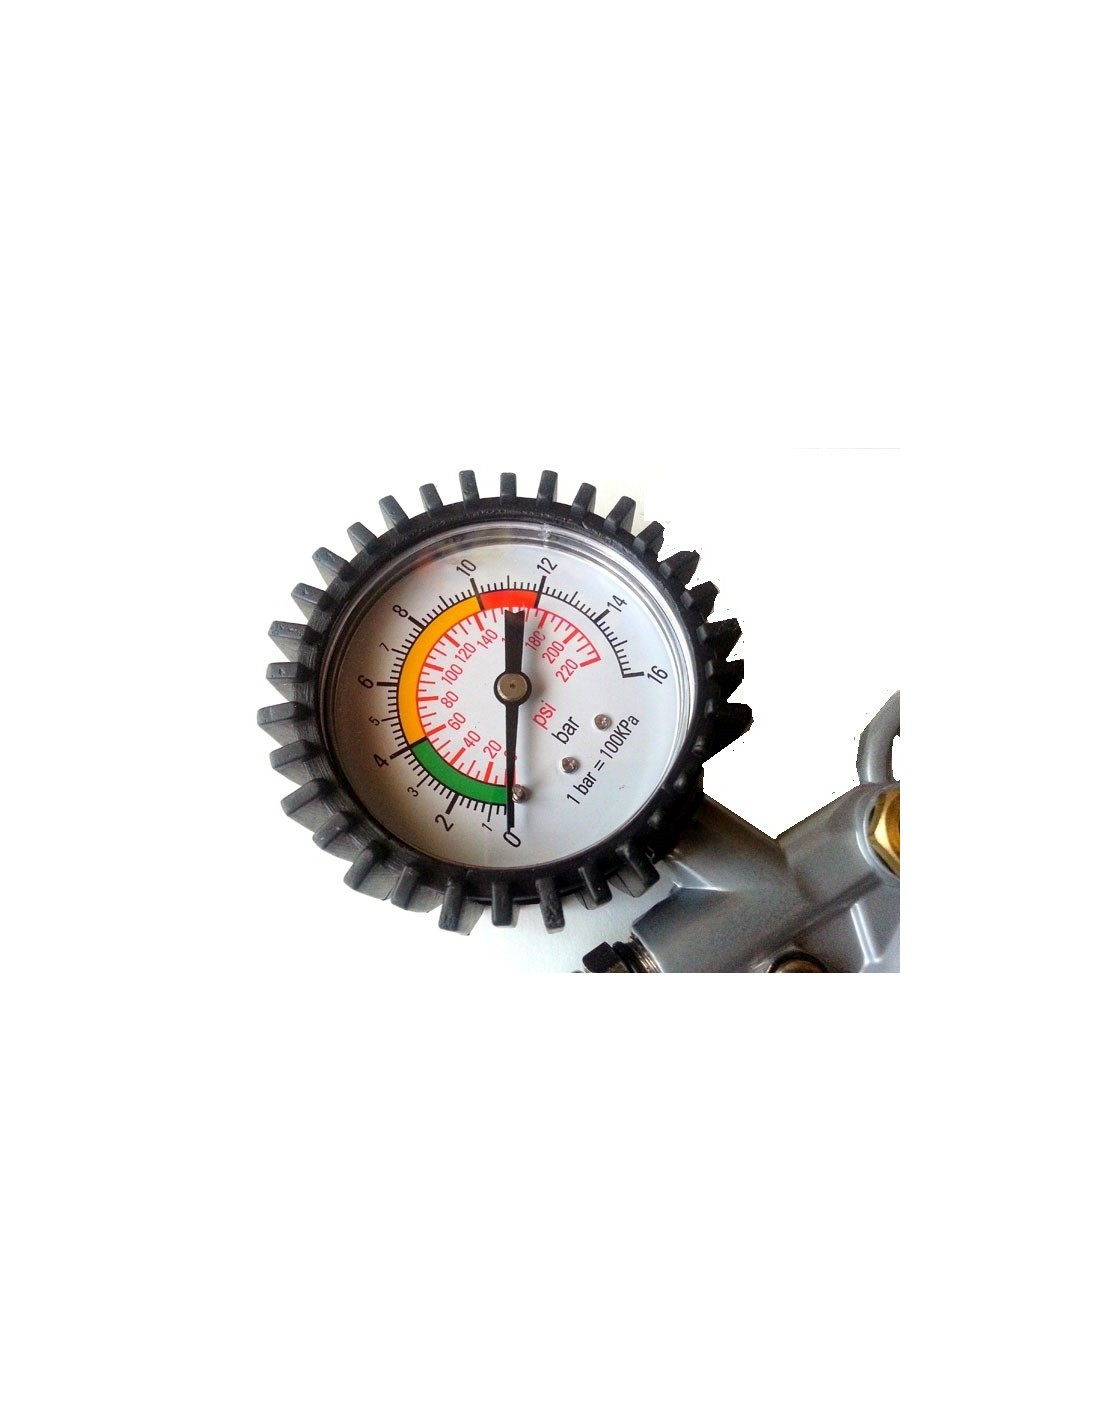 Manometro de presion for Manometro para medir presion de agua